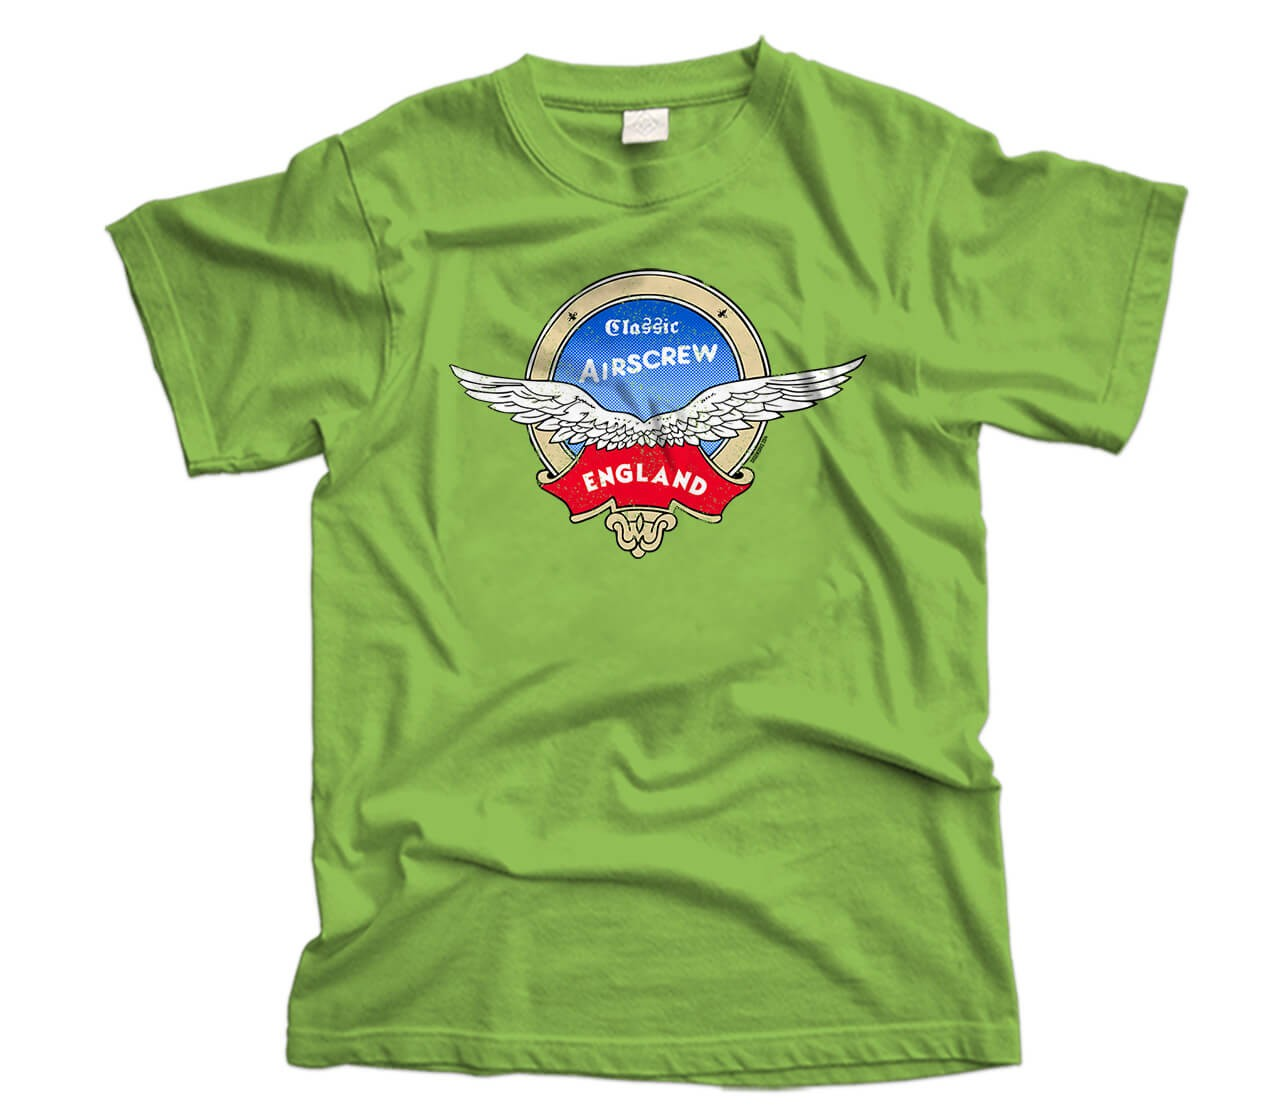 Classic Airscrew 2 Aircraft T-Shirt